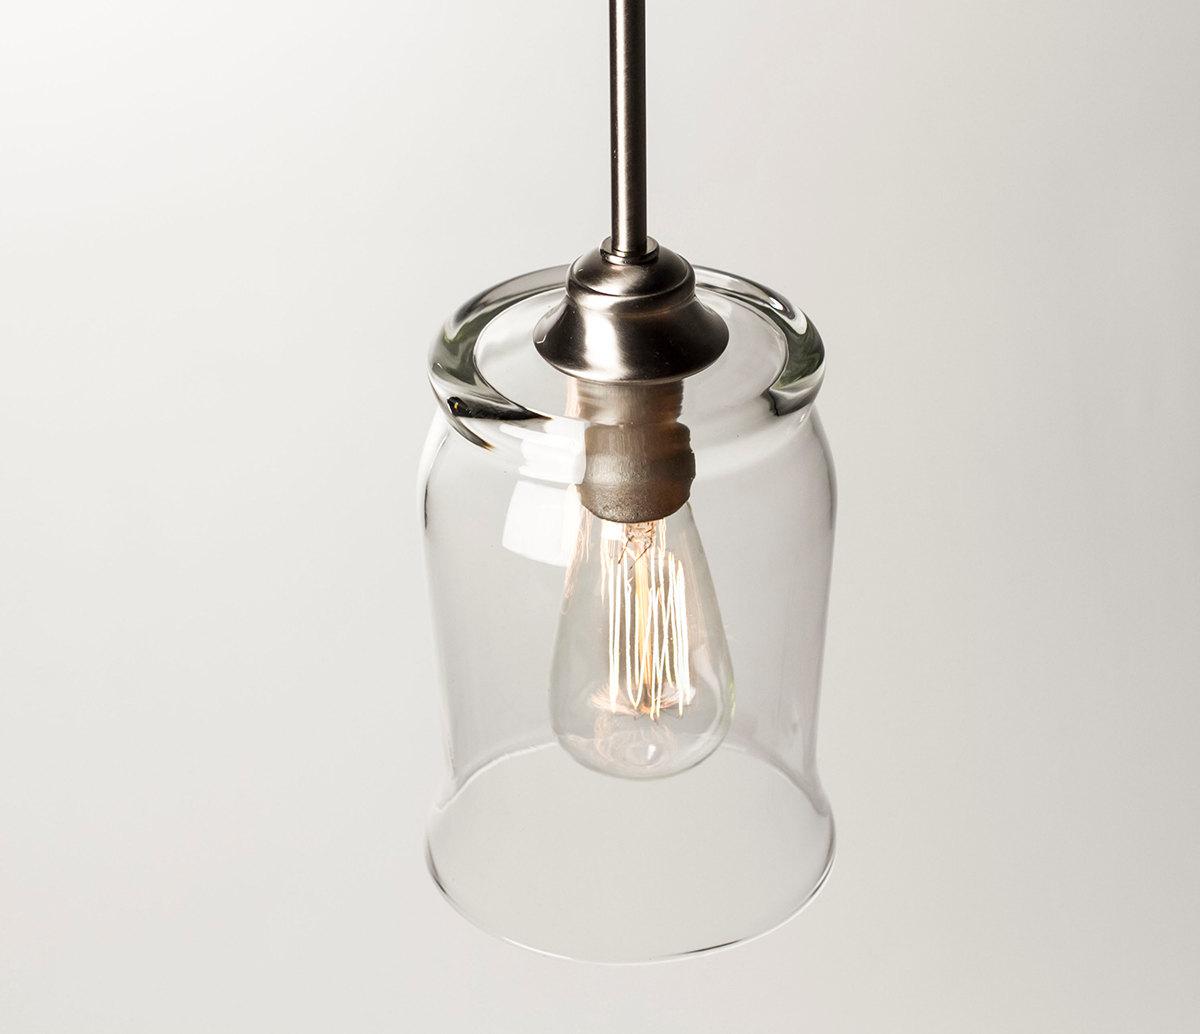 pendant light fixture edison bulb barrel dan cordero. Black Bedroom Furniture Sets. Home Design Ideas